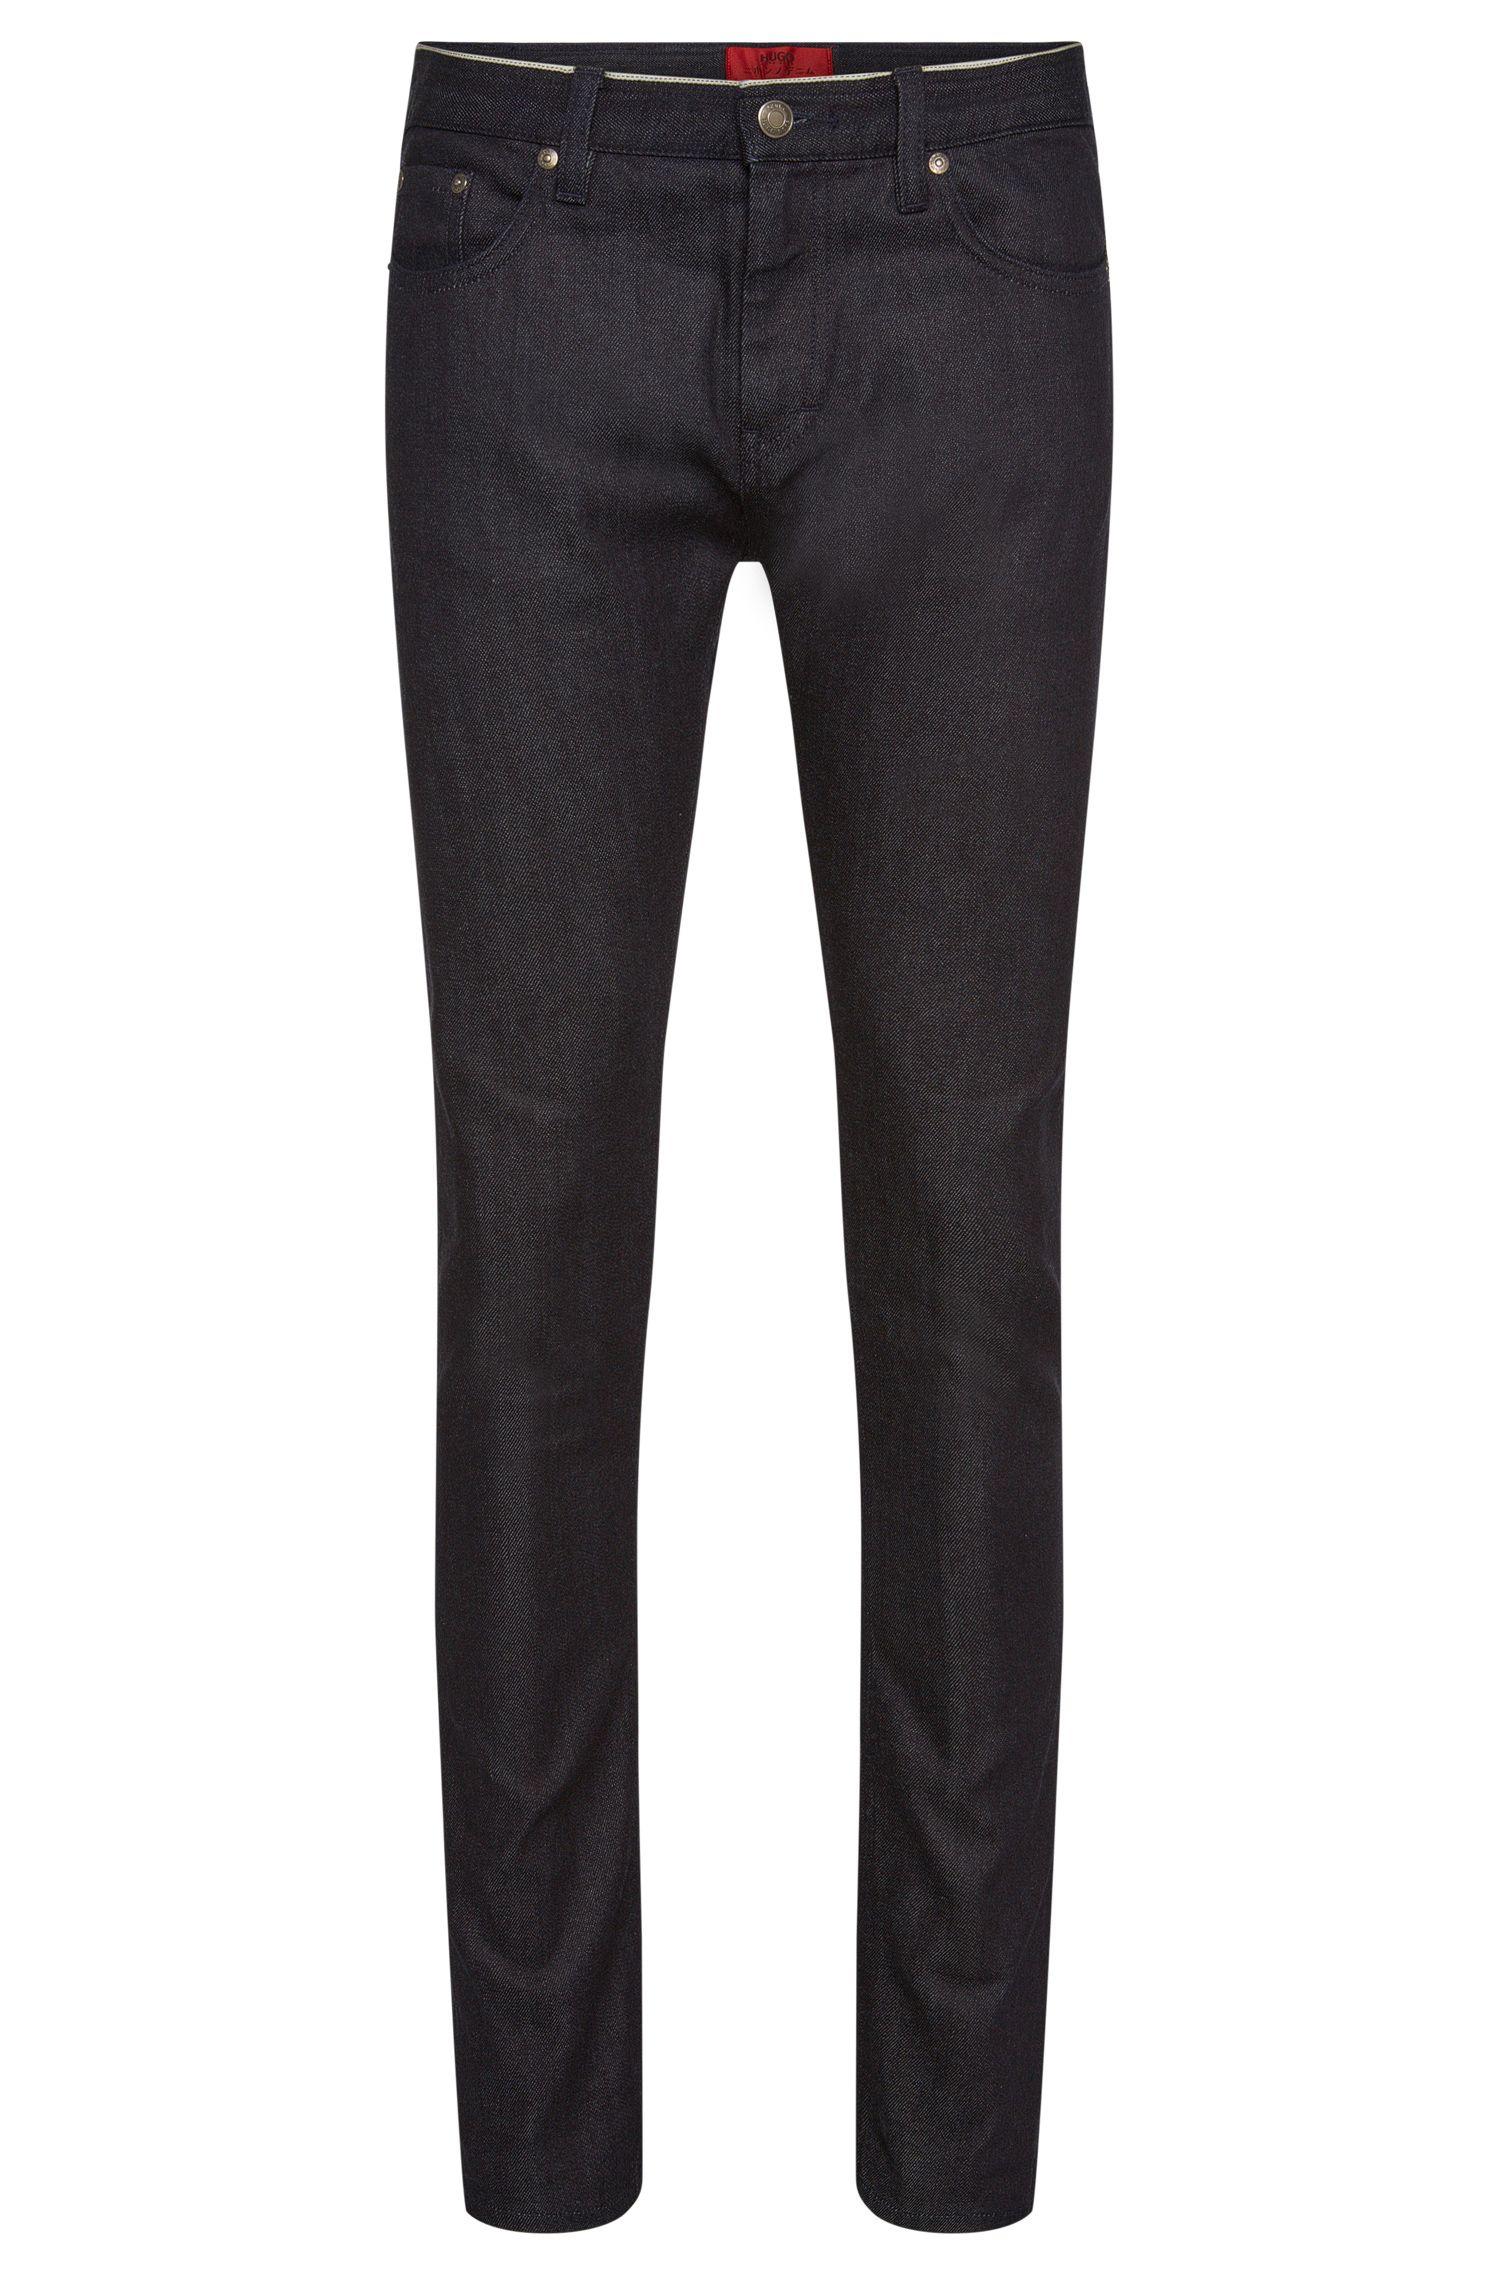 'HUGO 733' | Skinny Fit, 10.25 oz Stretch Cotton Selvedge Jeans